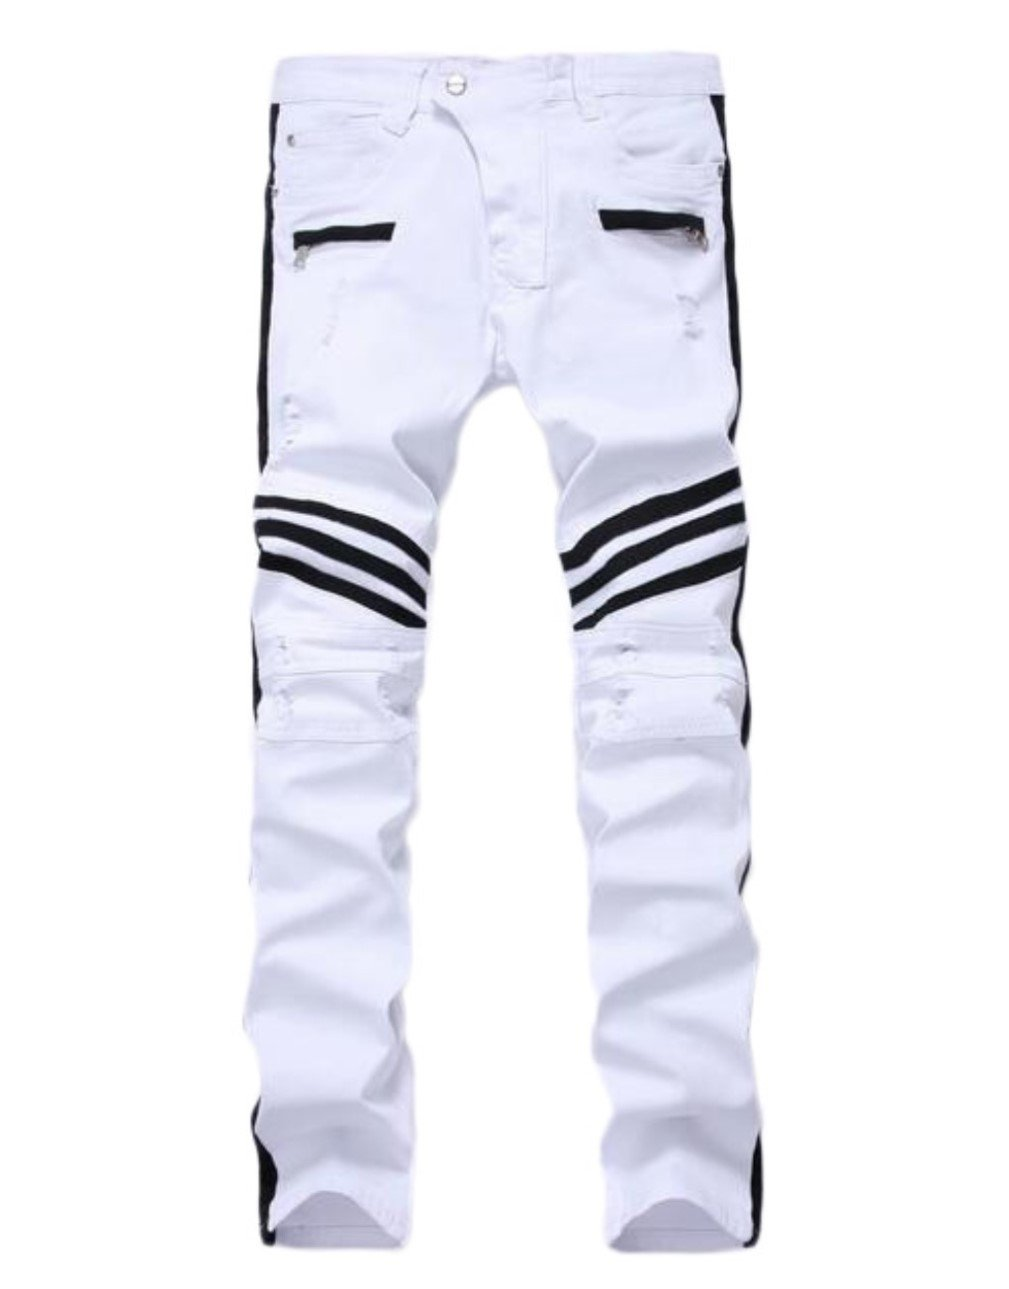 Juakita Barpsa Men's White Biker Ripped Destroyed Distressed Straight Slim Fit Skinny Jeans W42